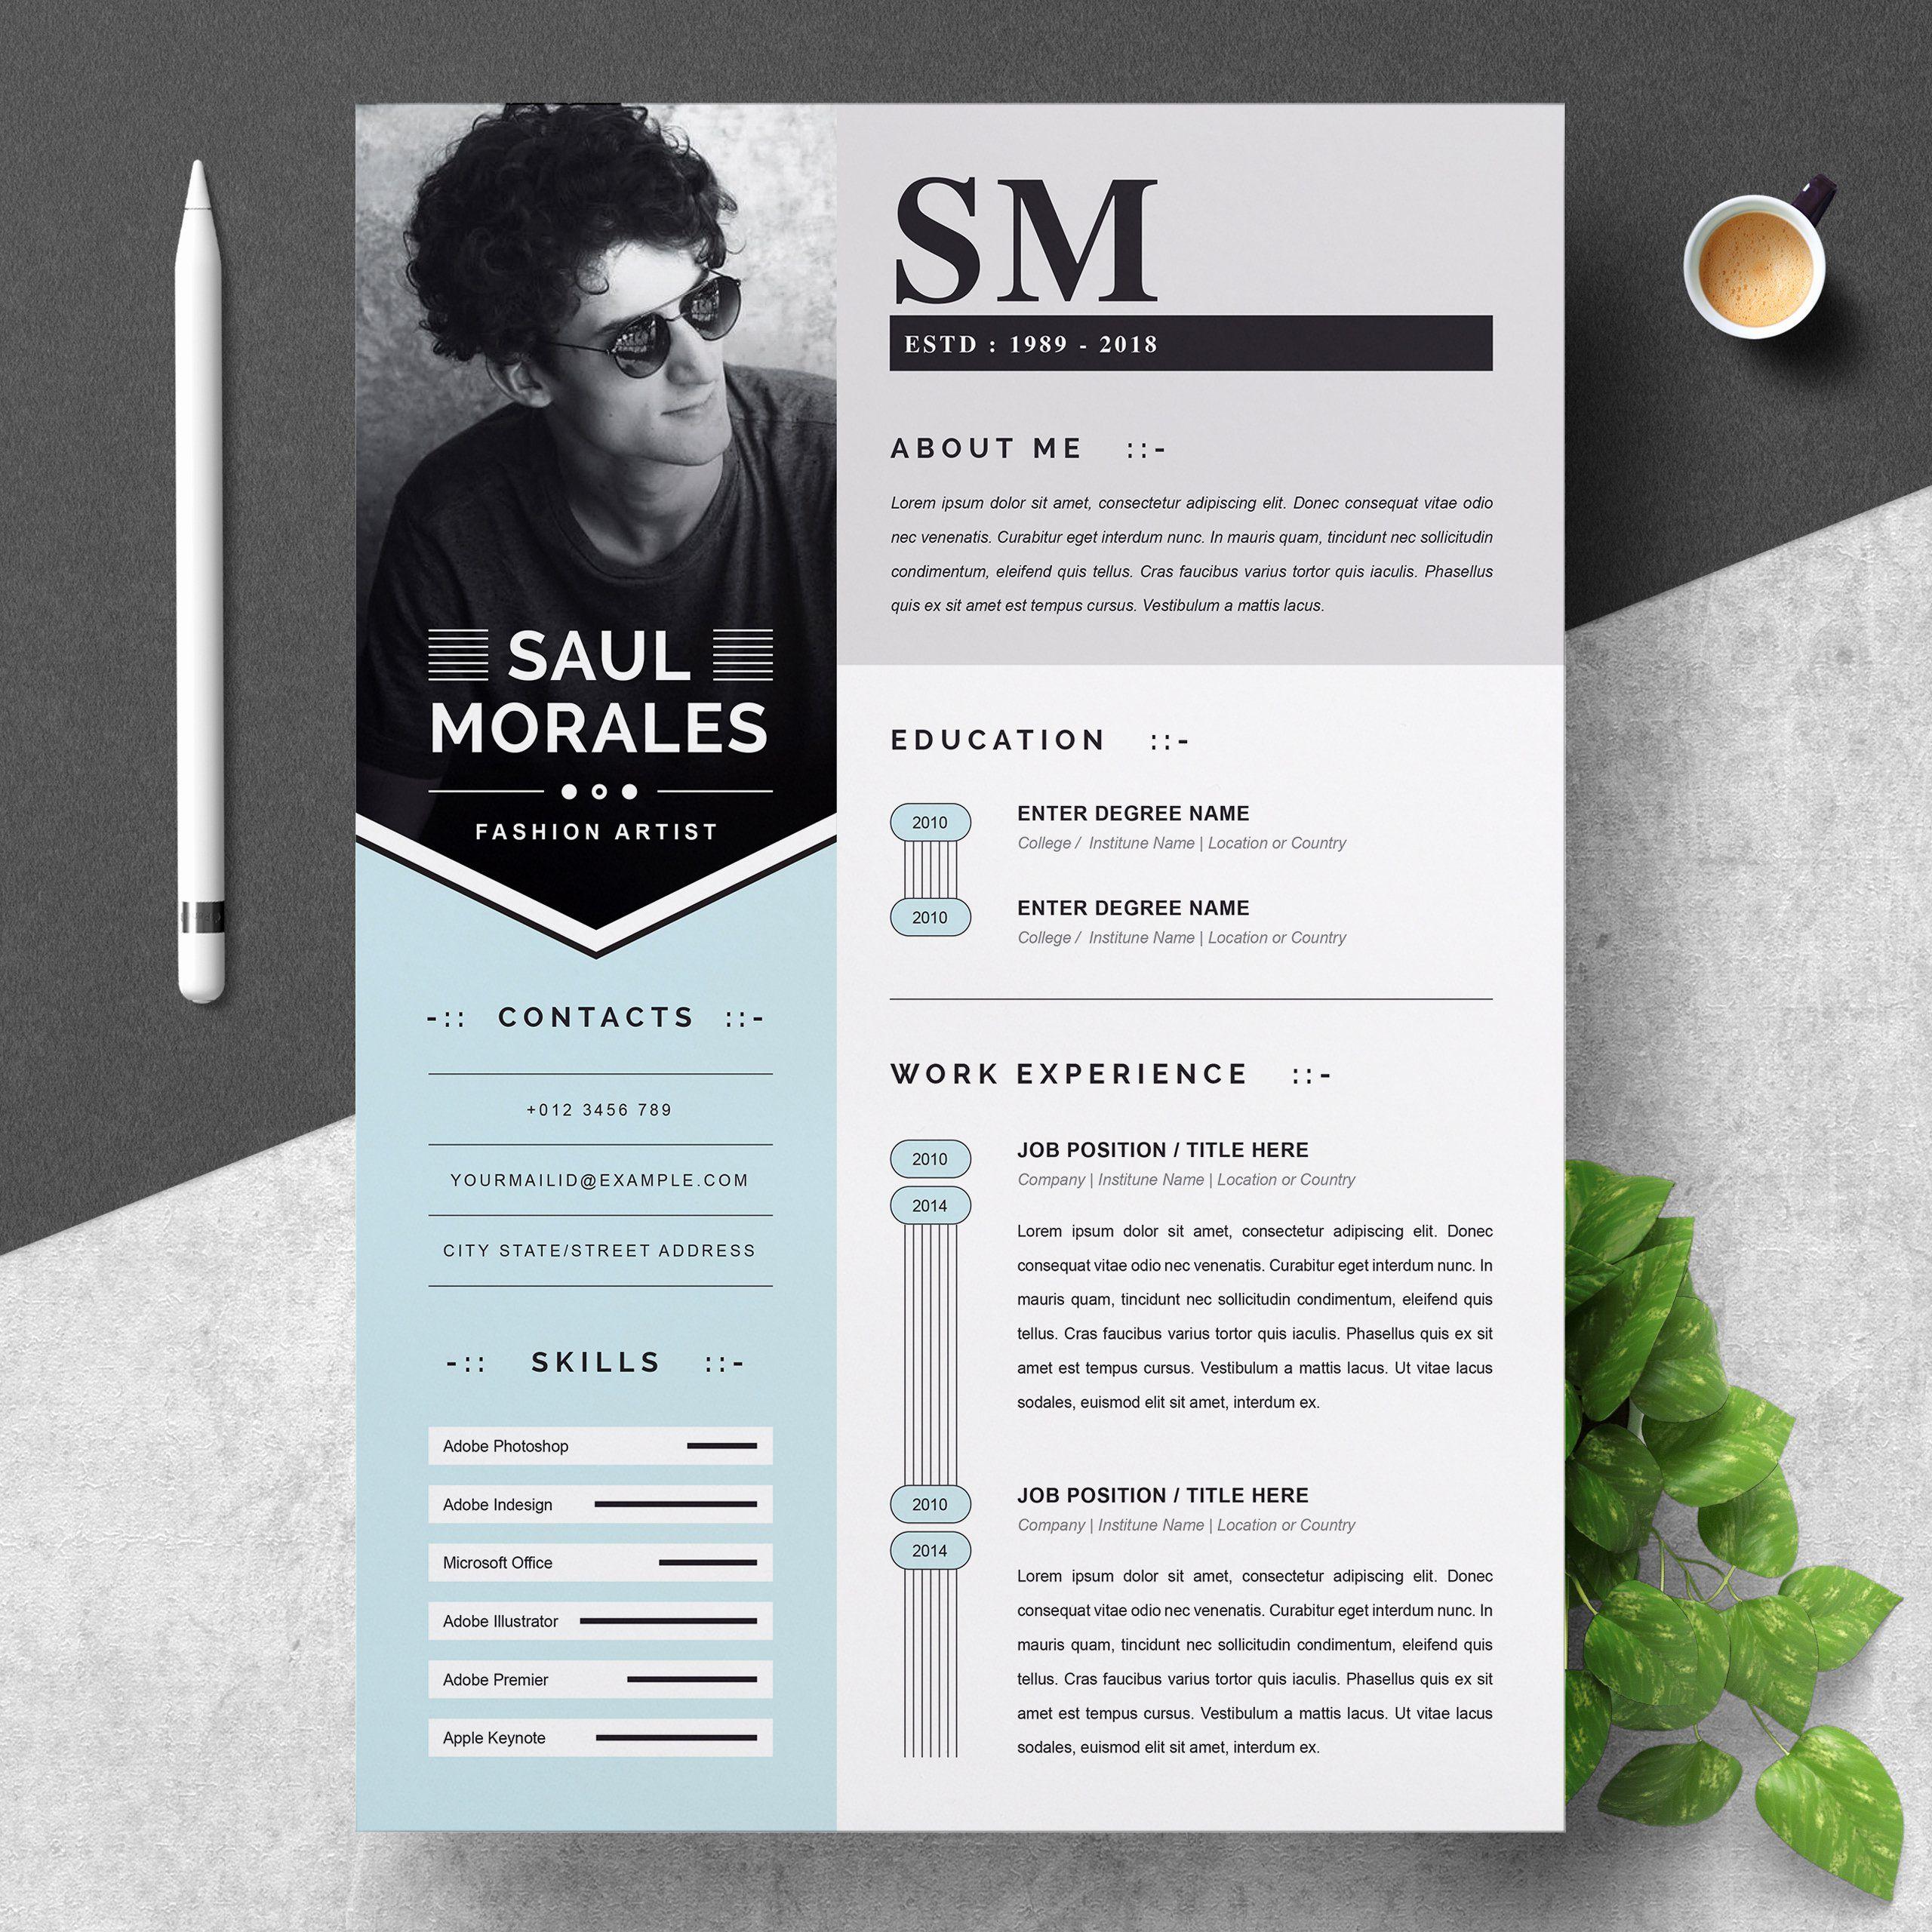 Creative Resume Templates Free Word Awesome Creative Resume Templates Free Premim Cv Templates Cv Graphiste Modele Cv Curriculum Vitae Word